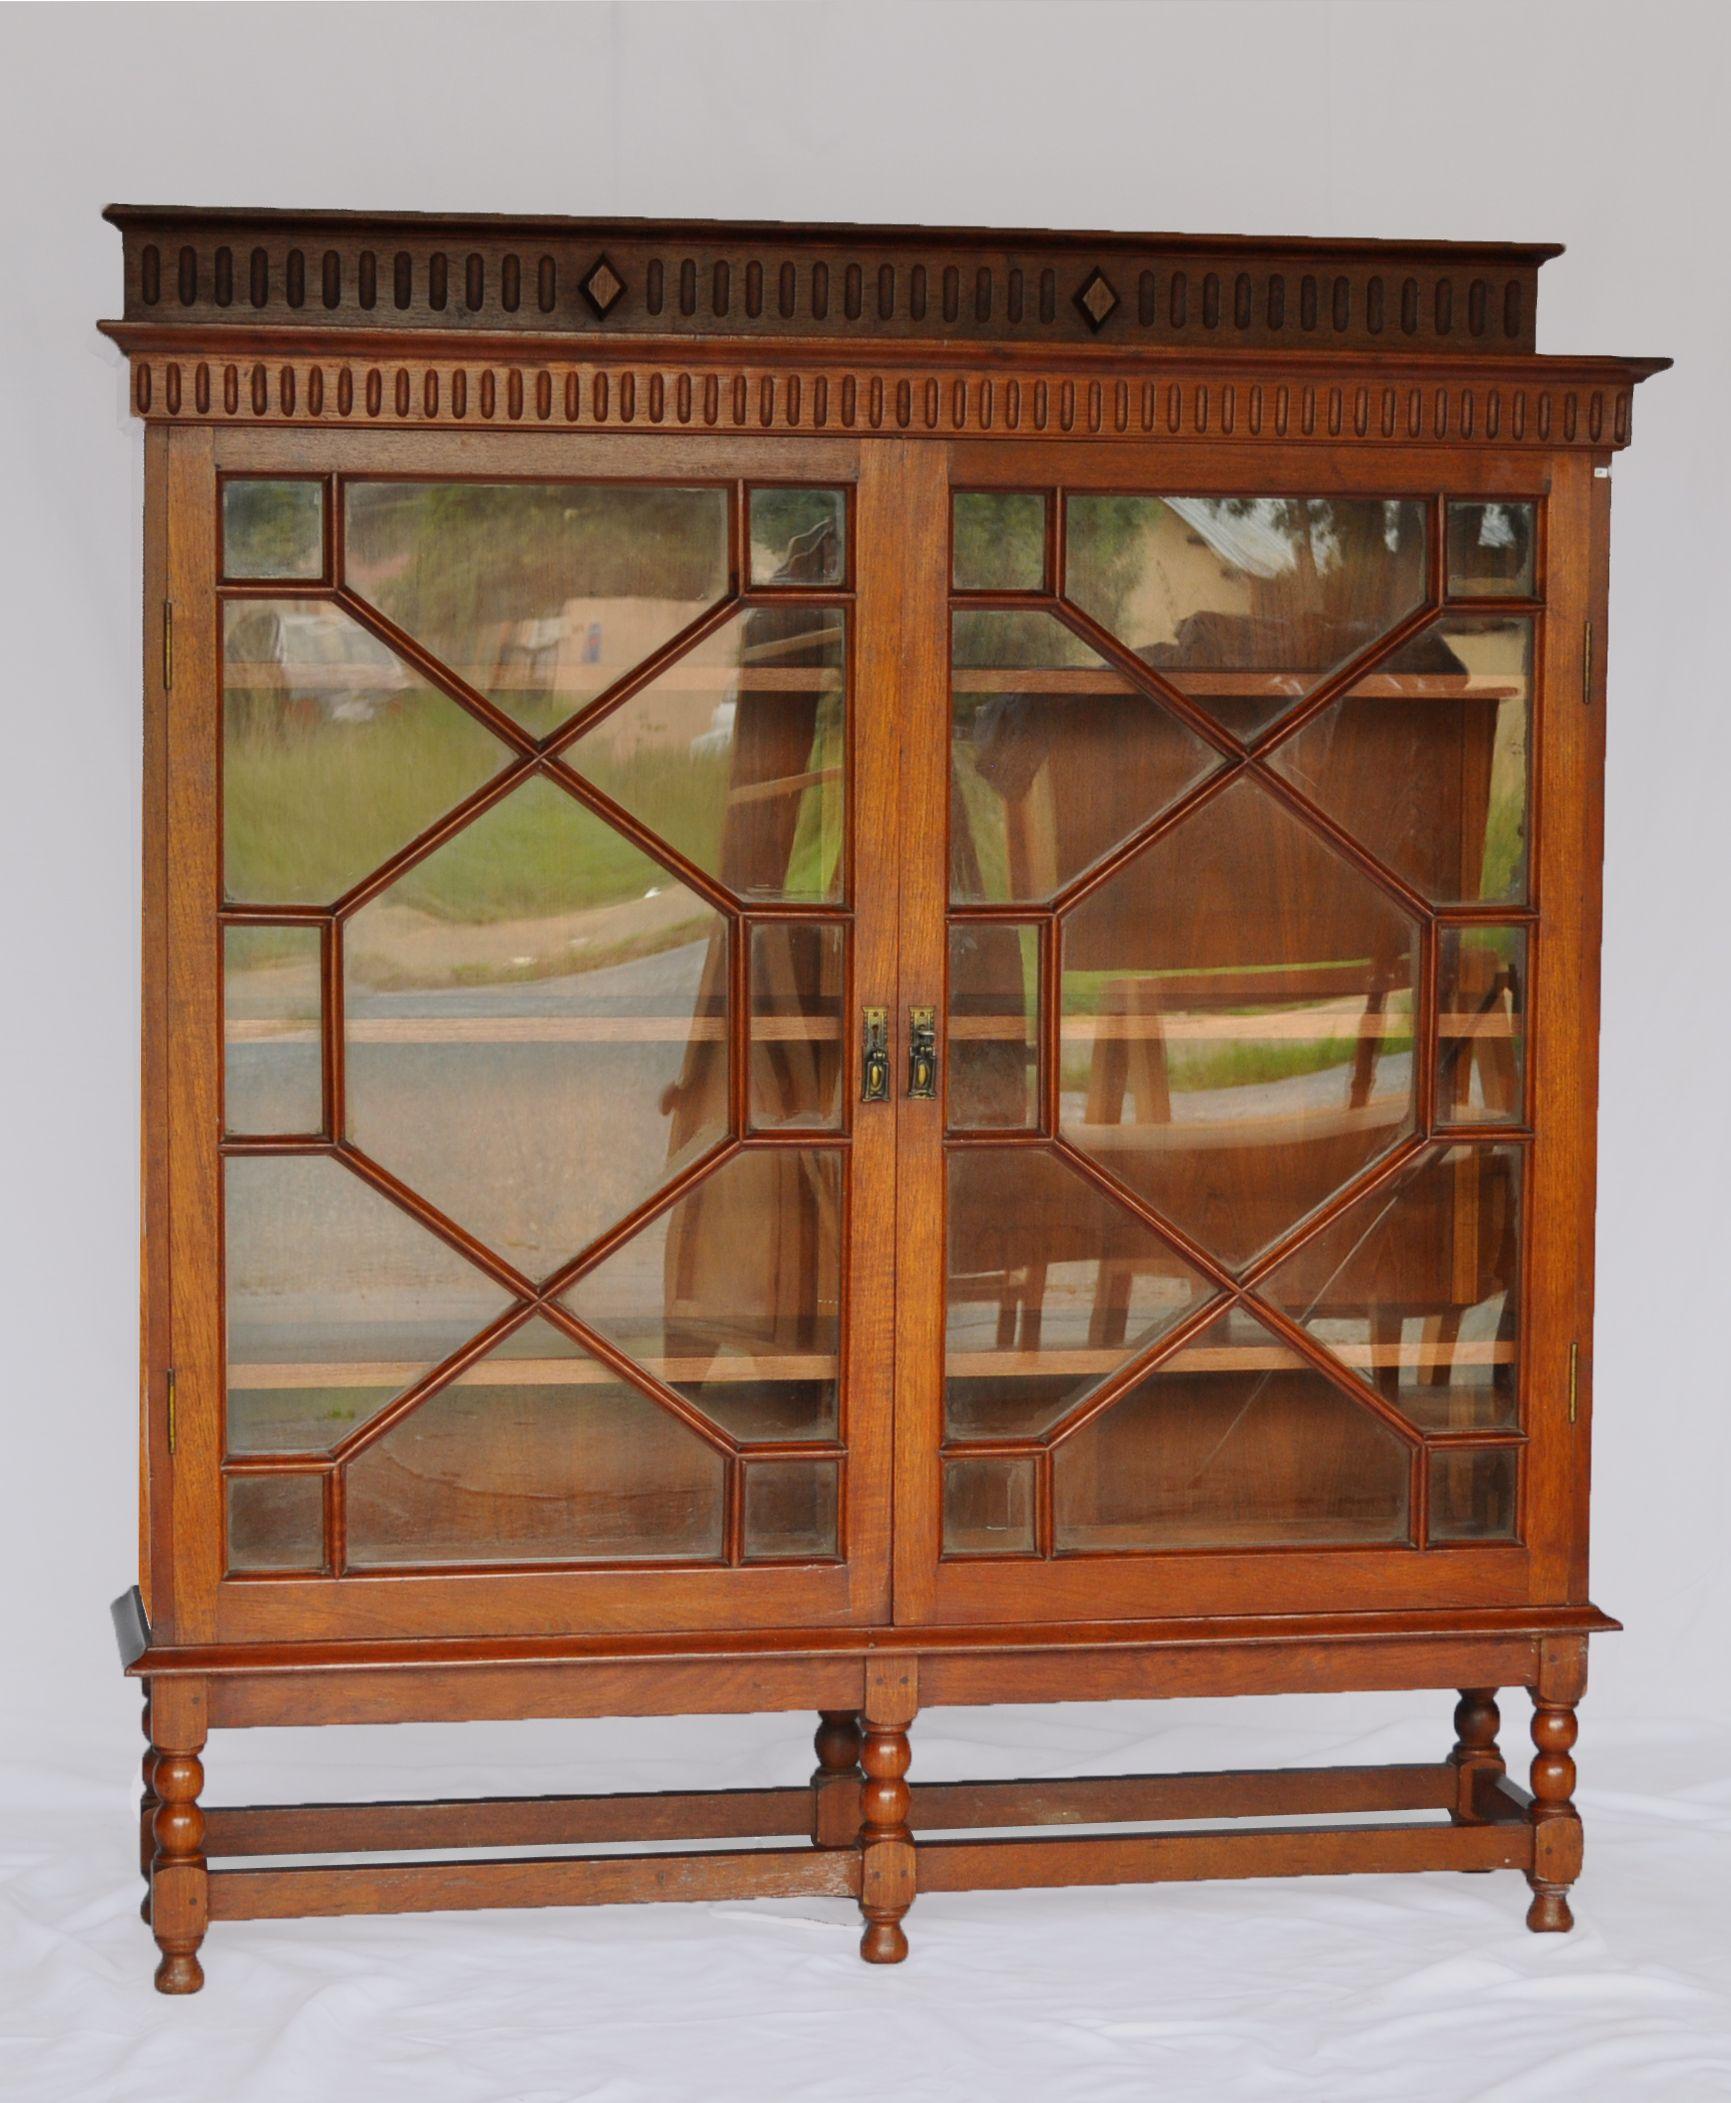 used teak furniture. #NorthcliffAntiques Large Quantities Of #teak (tectona Grandis) Was Imported To SA From Used Teak Furniture C